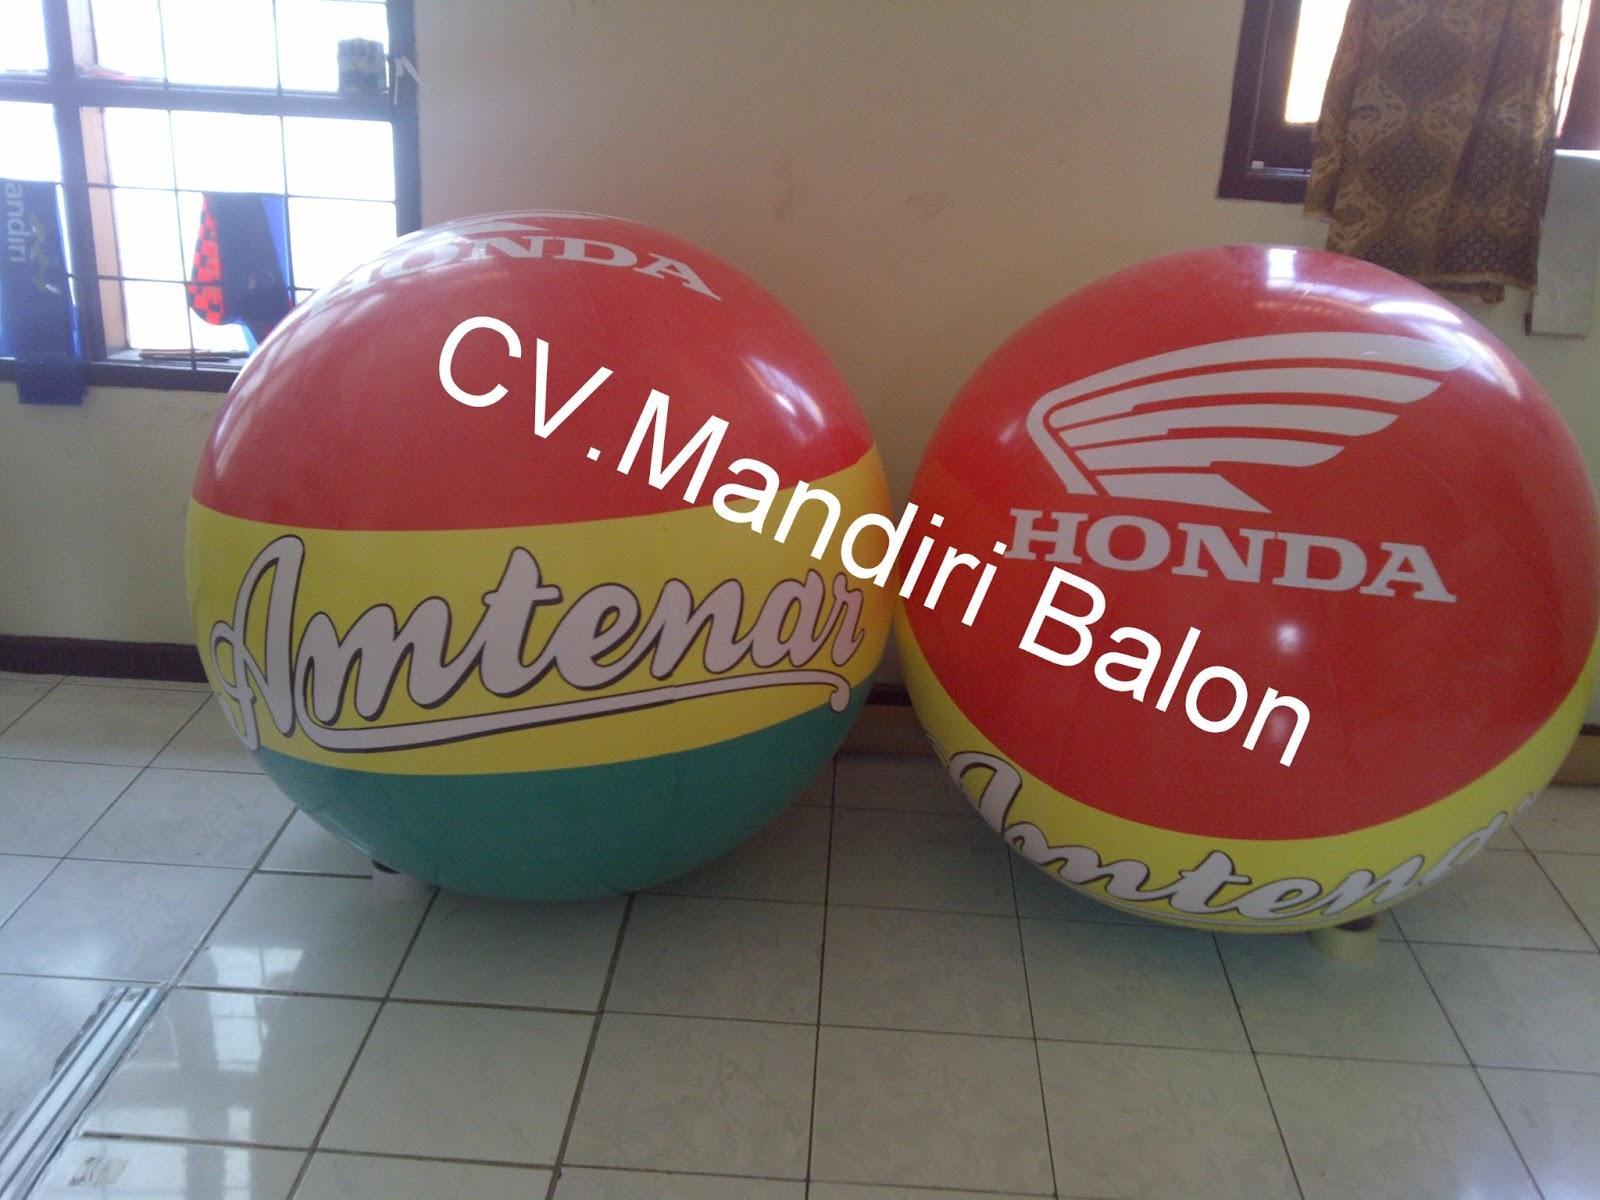 Balon Honda